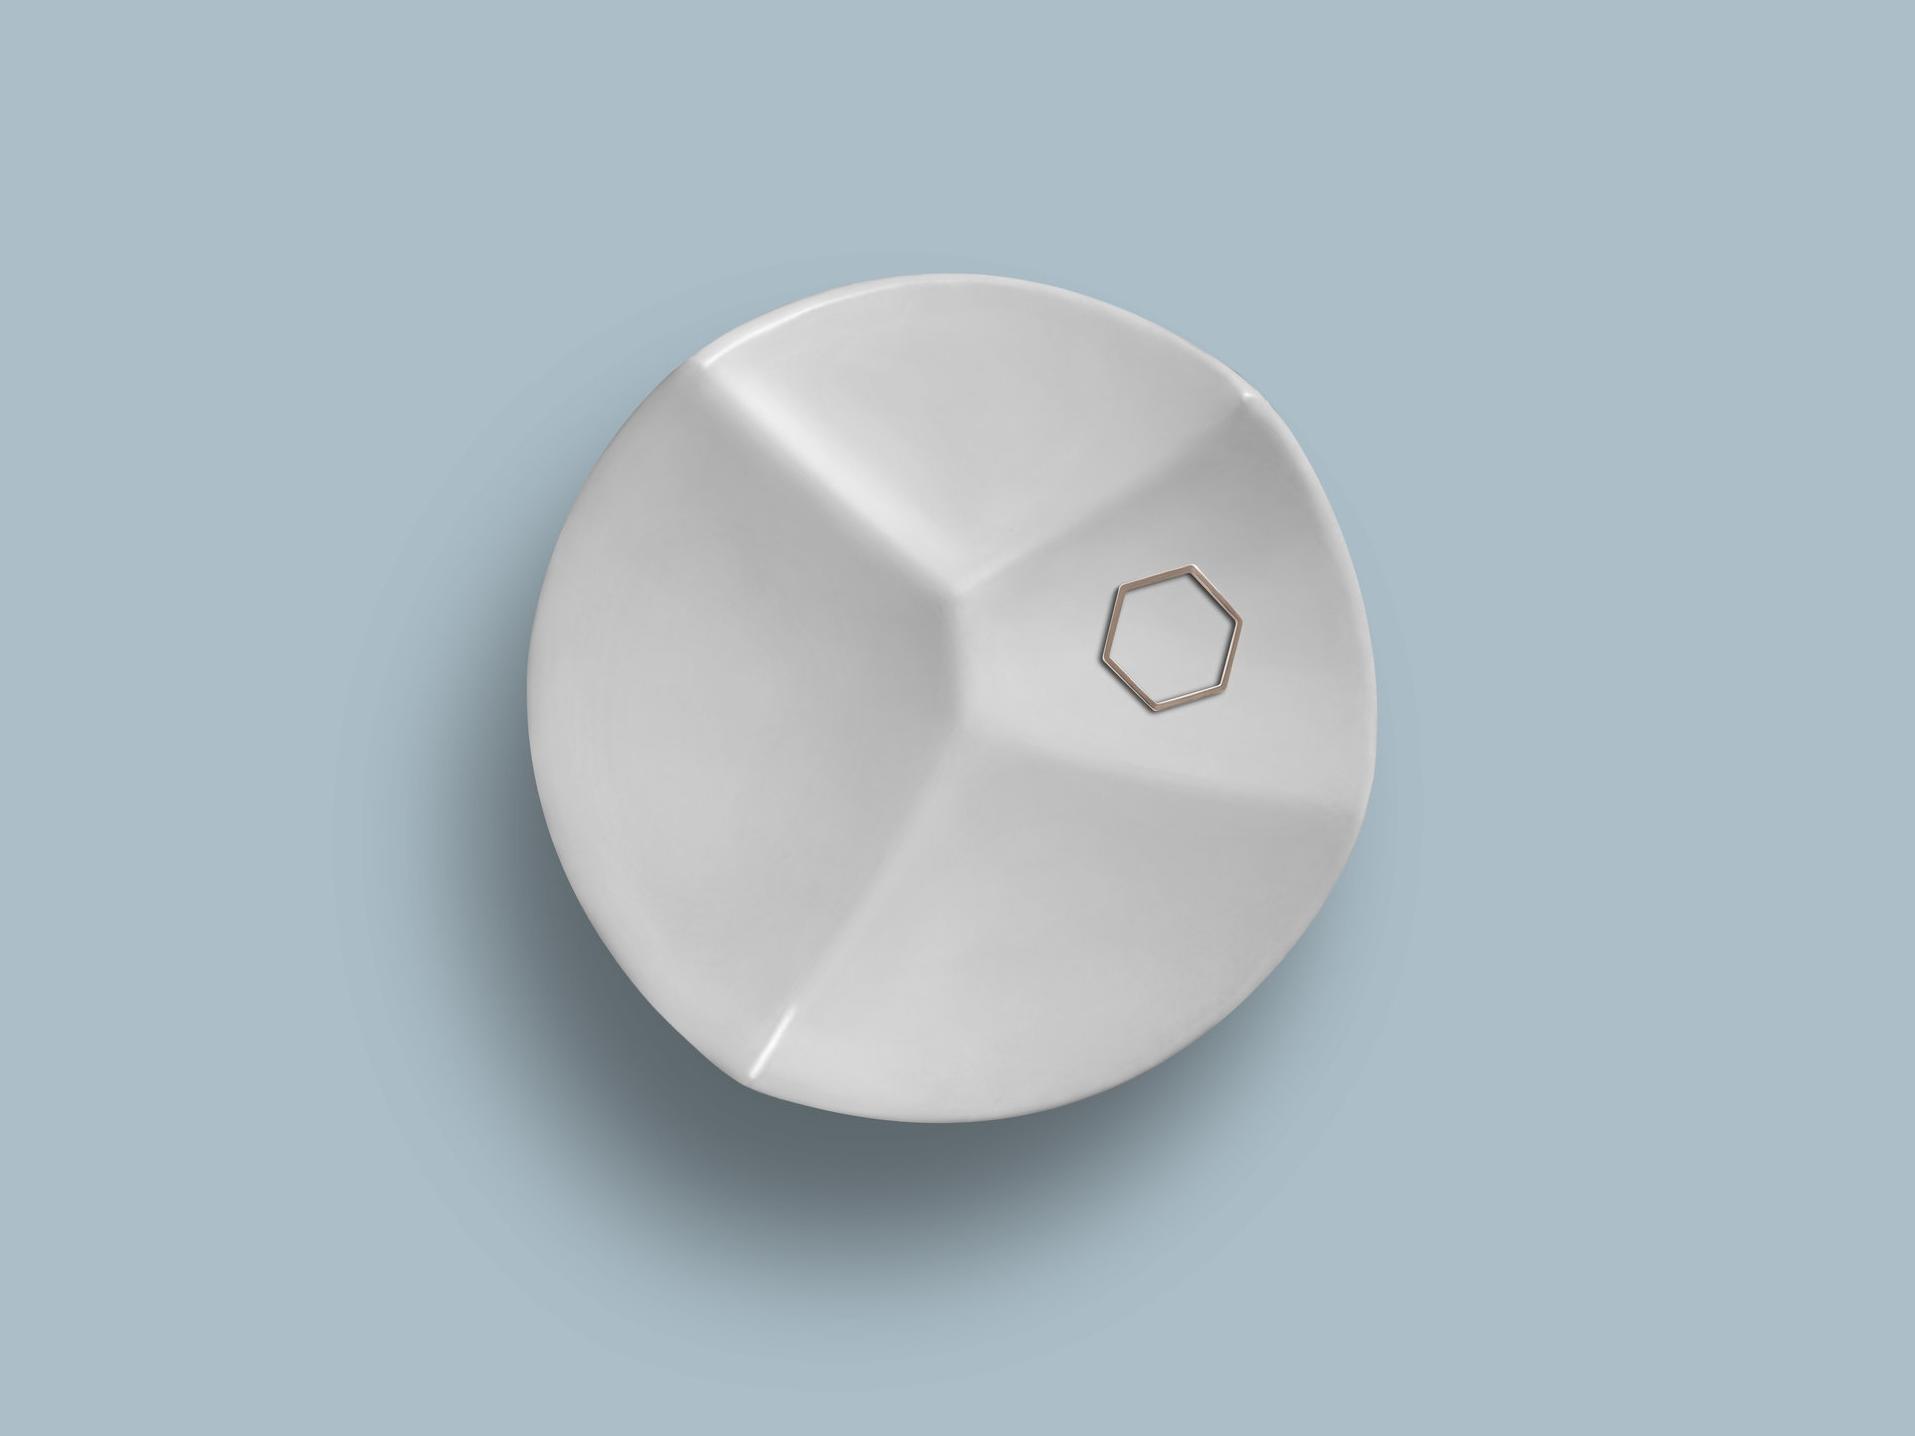 OTHR-Product-09202016-4116-Props-Lt-Blue.jpg